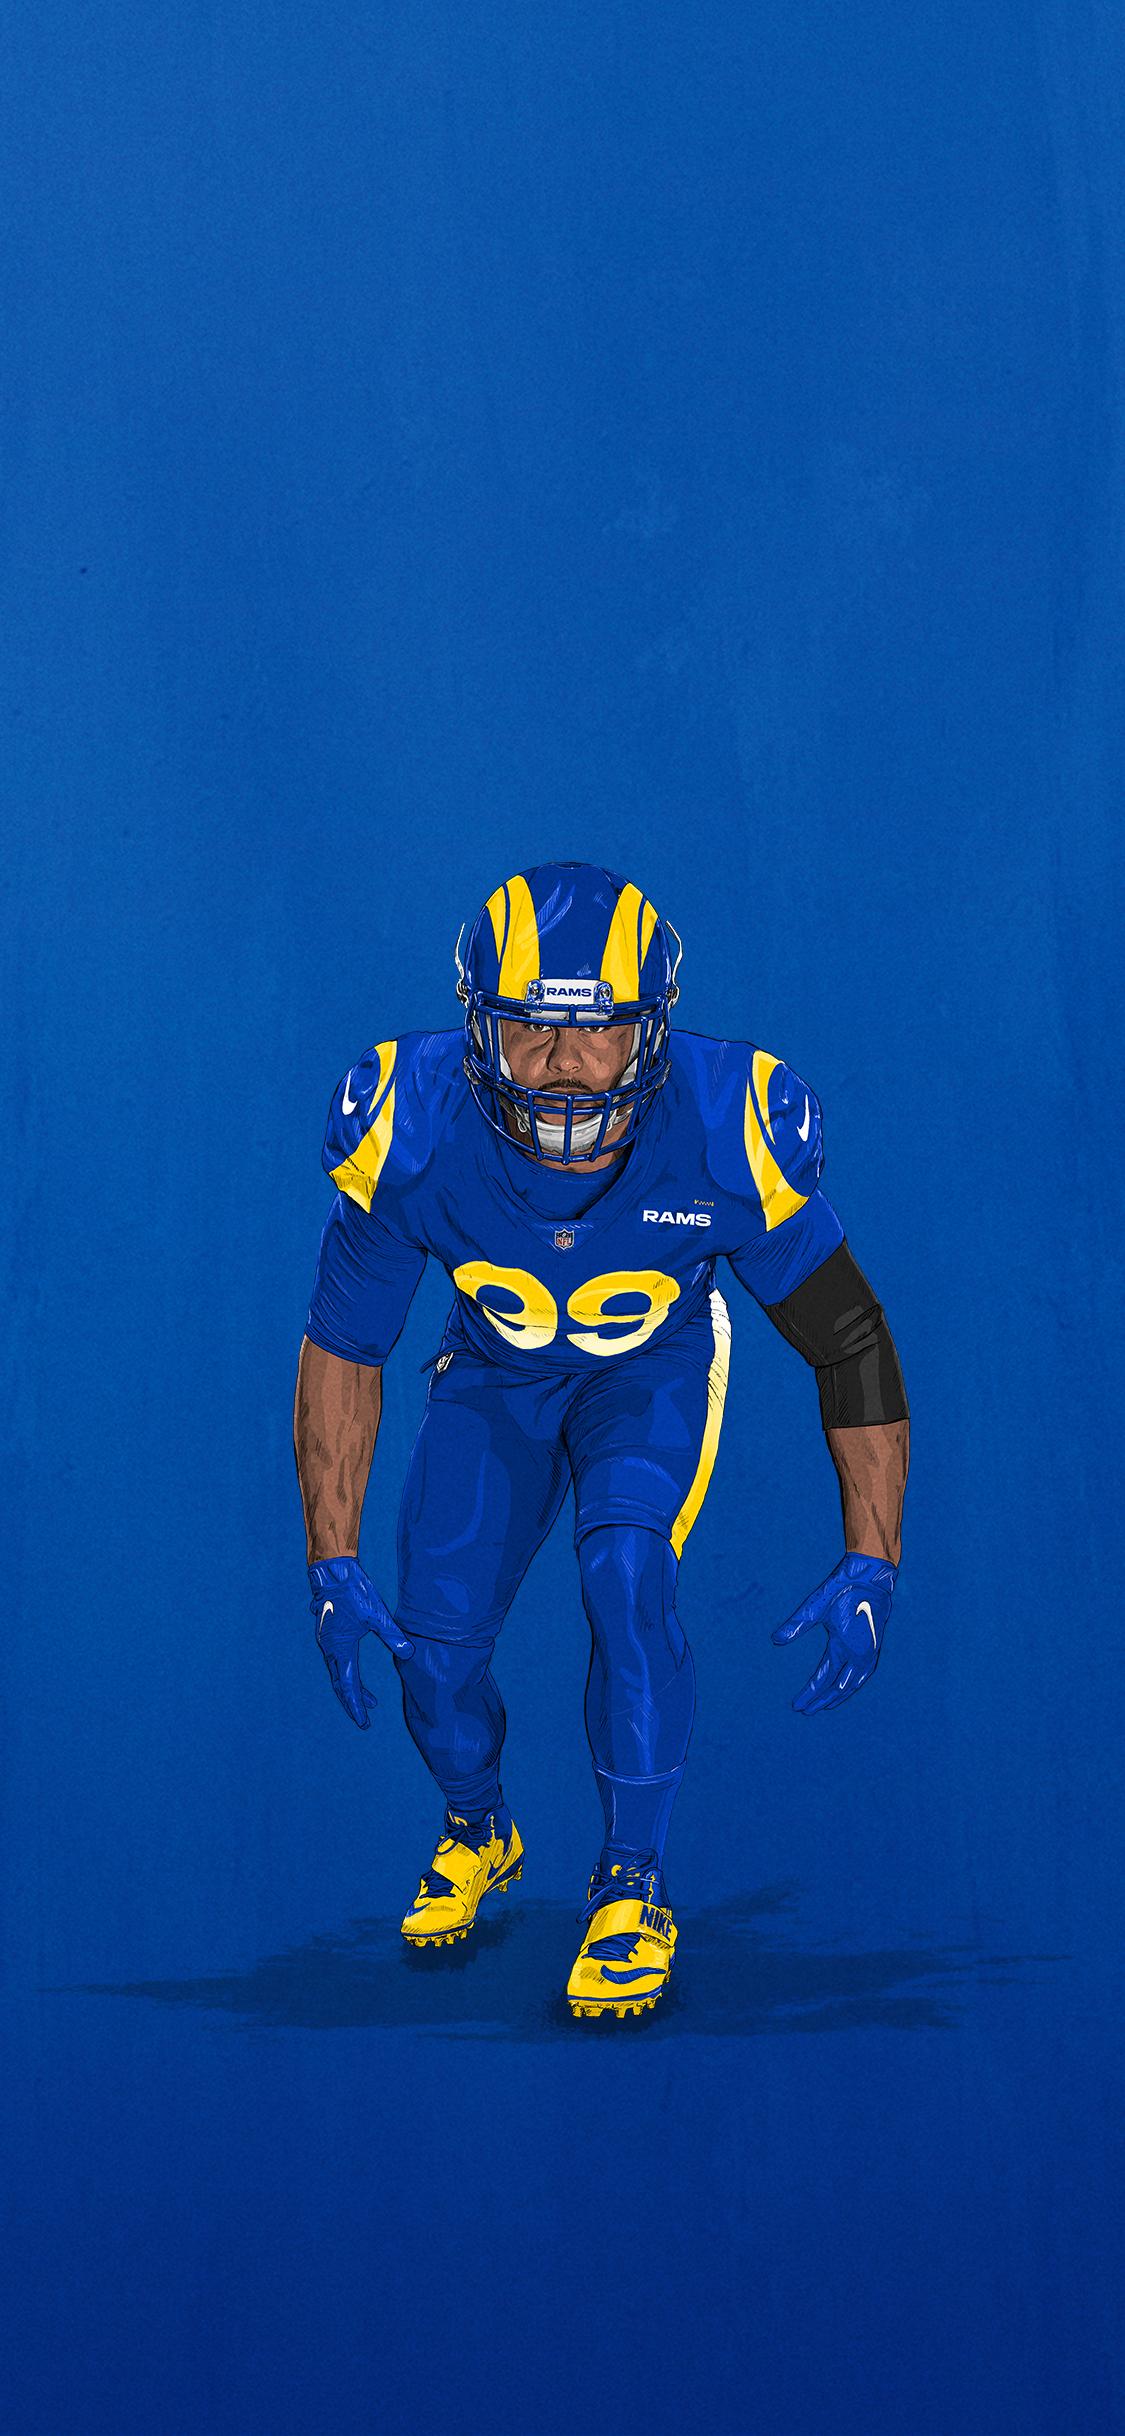 Rams Wallpapers Los Angeles Rams Therams Com